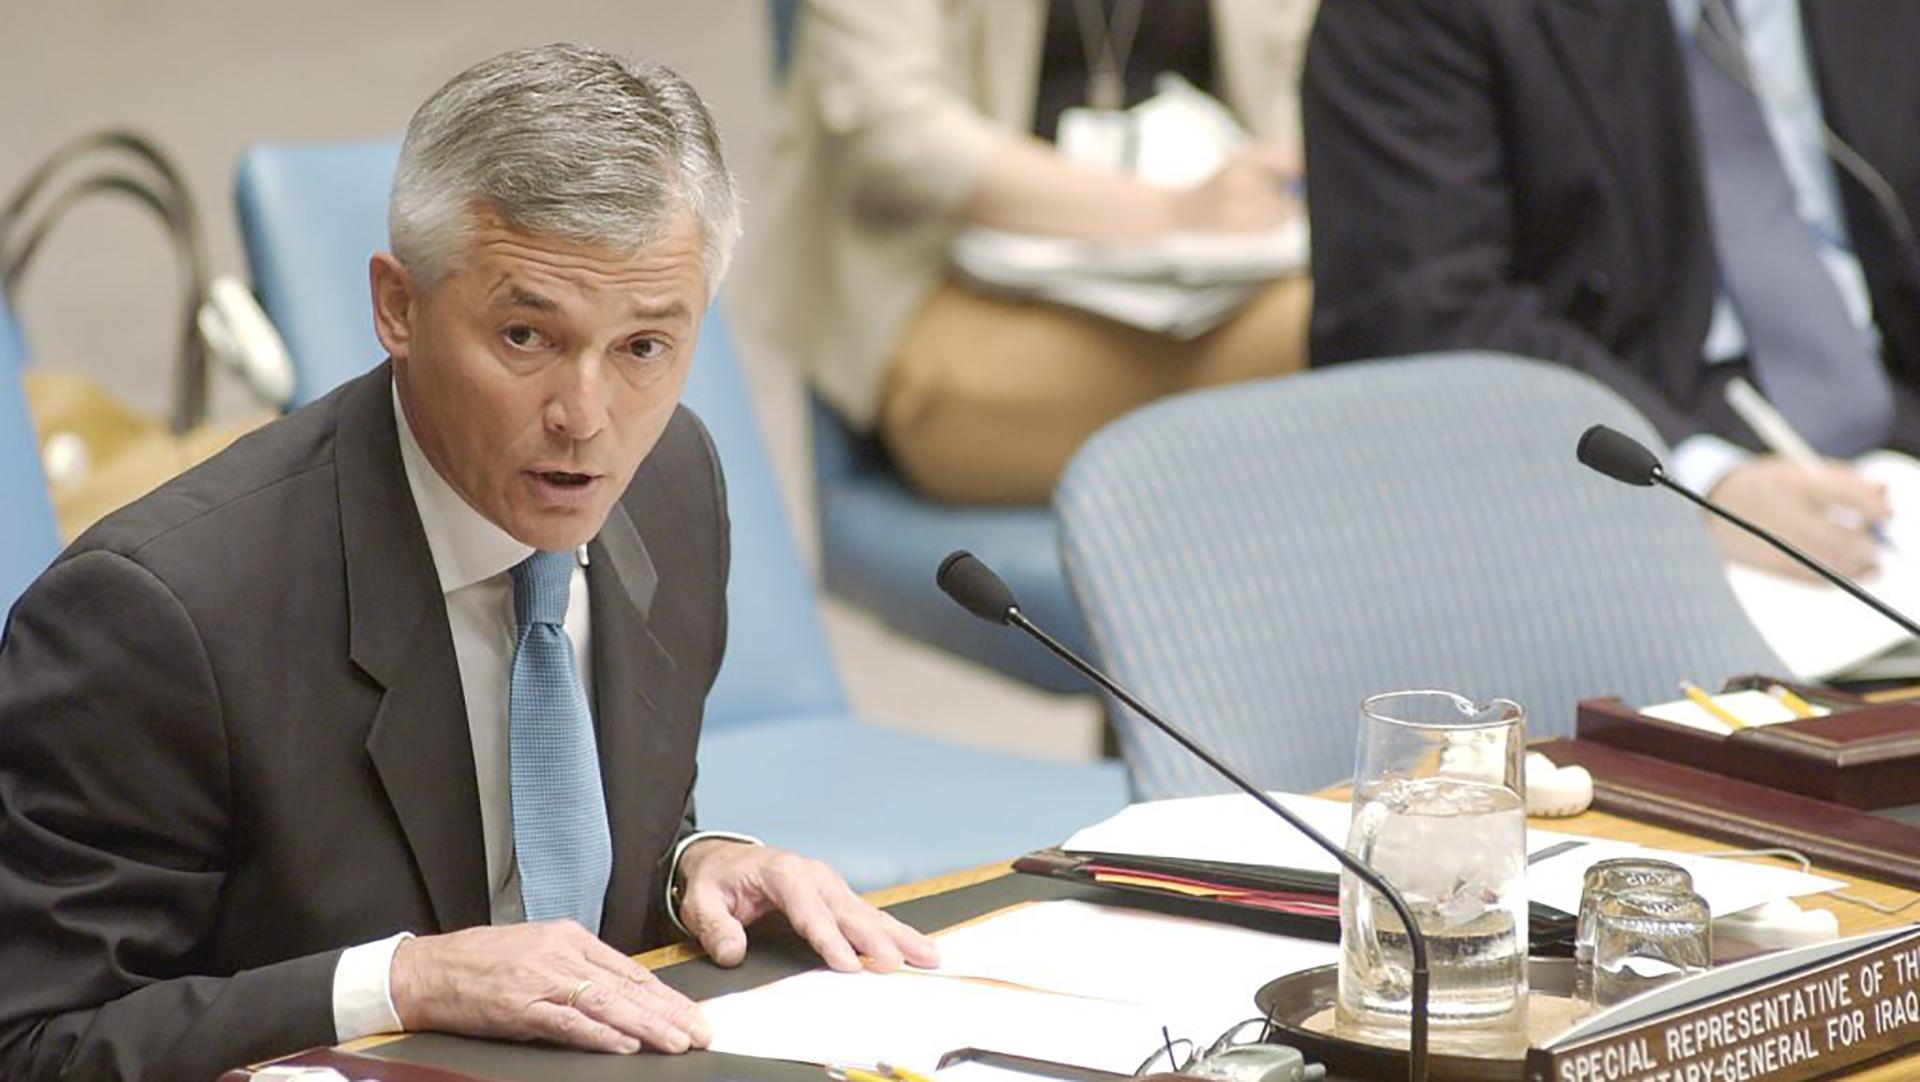 Sergio Vieira de Mello, Brazilian diplomat and former UN High Commissioner for Human Rights